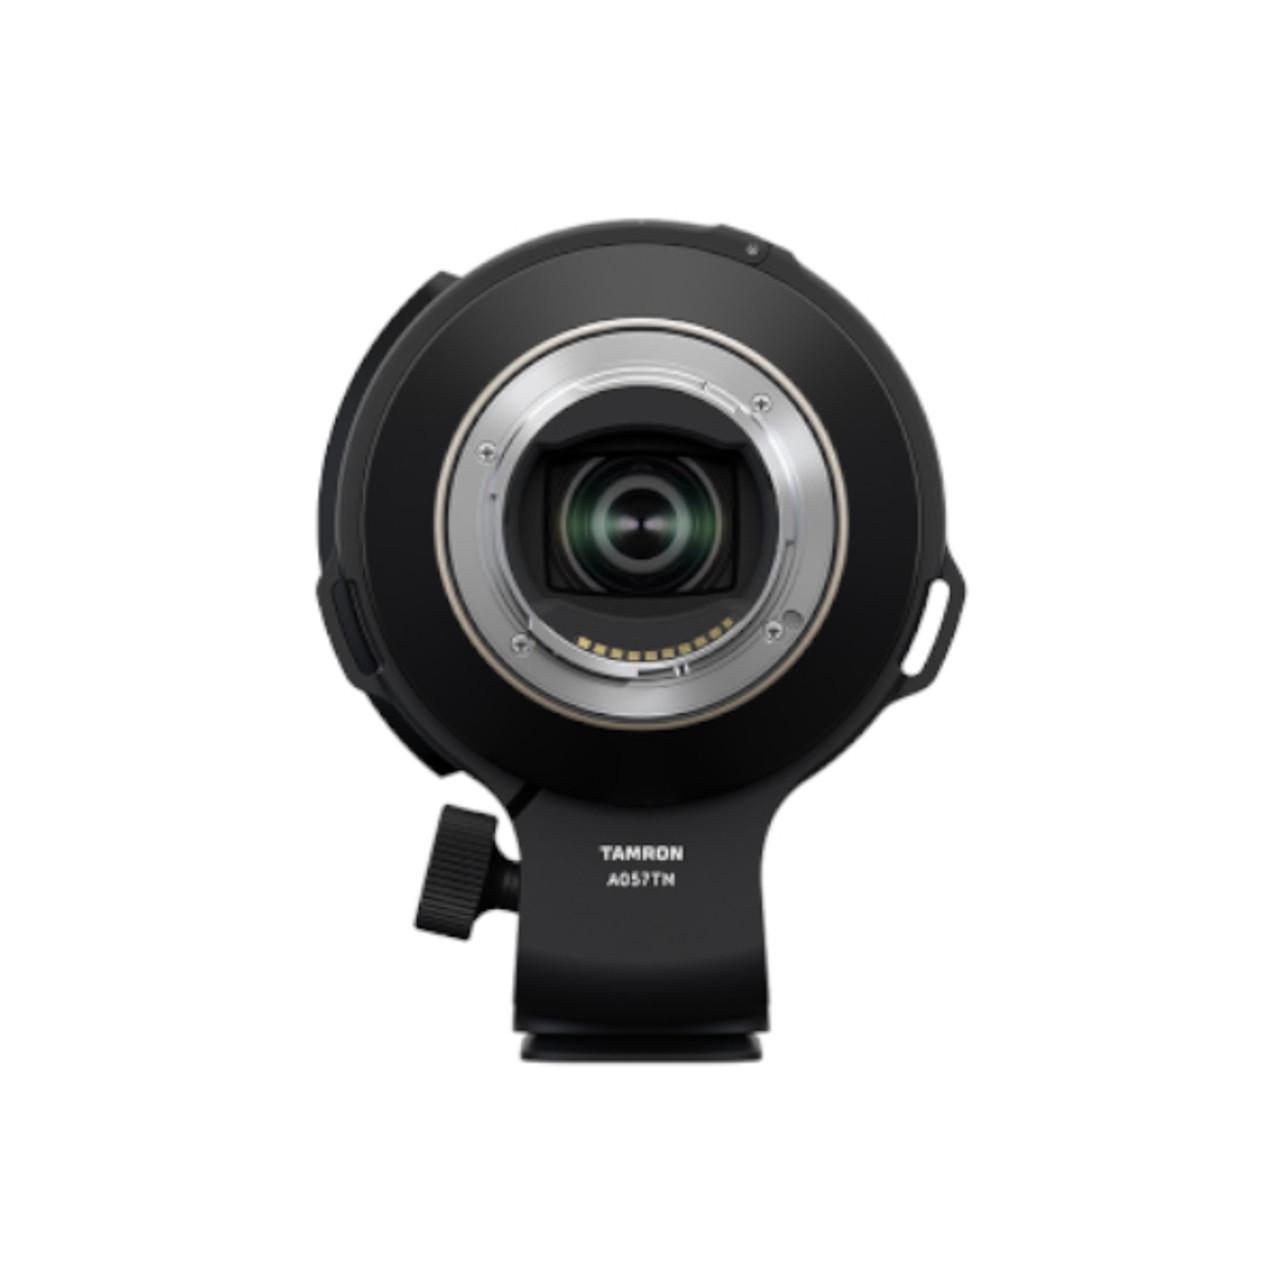 Tamron 150-500mm F5-6.7 Di III VC VXD Sony FE